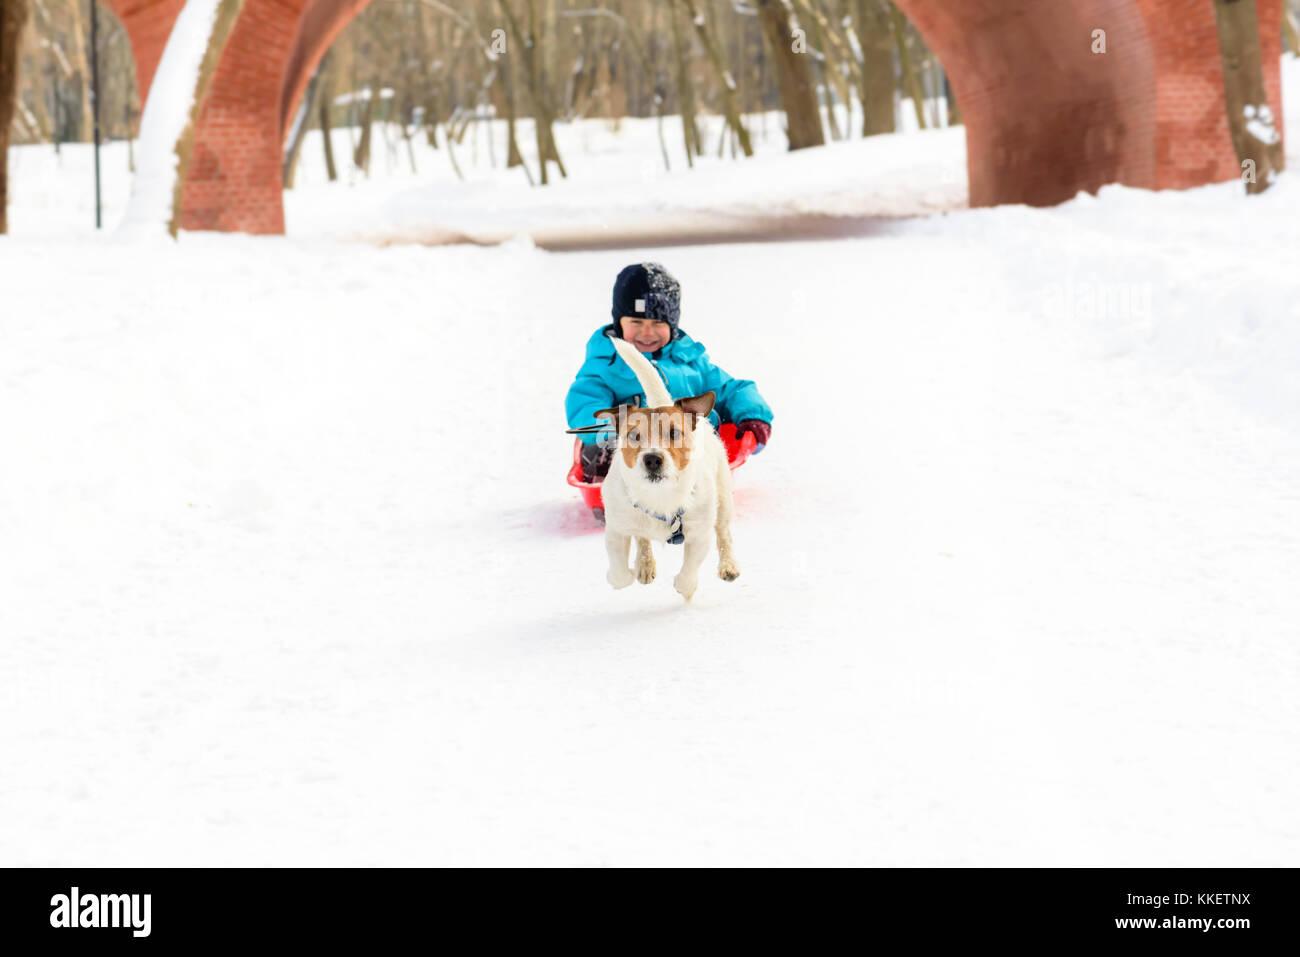 Smiling kid musher and his sled dog having fun at winter park - Stock Image